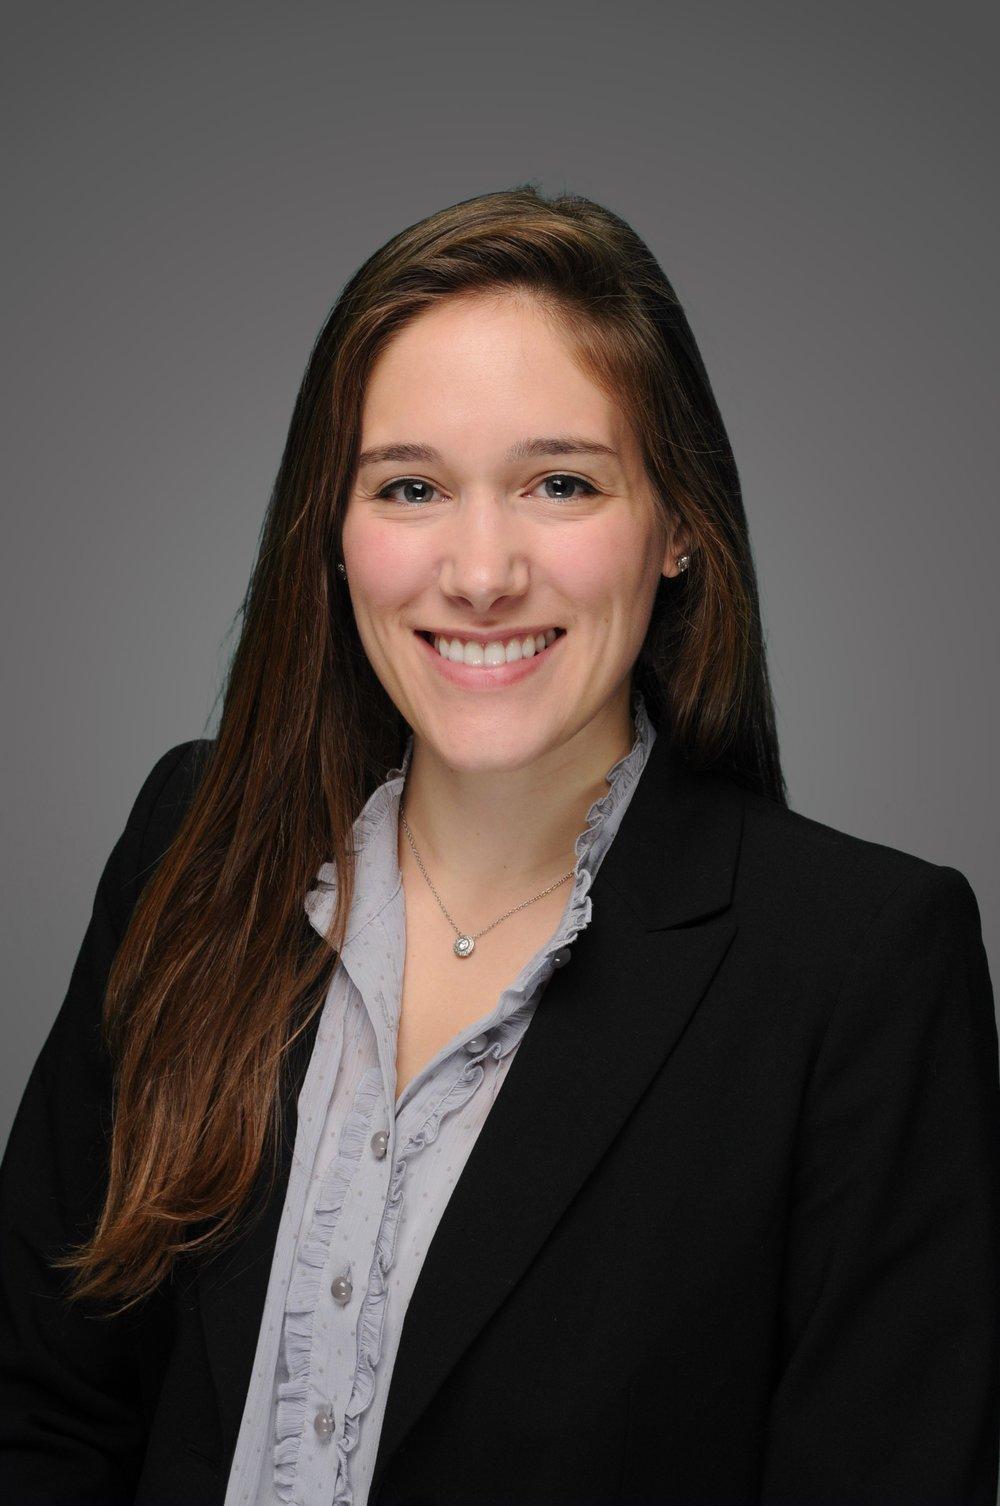 Alice Schnurman   AVP of Professional Development  ak4121@stern.nyu.edu